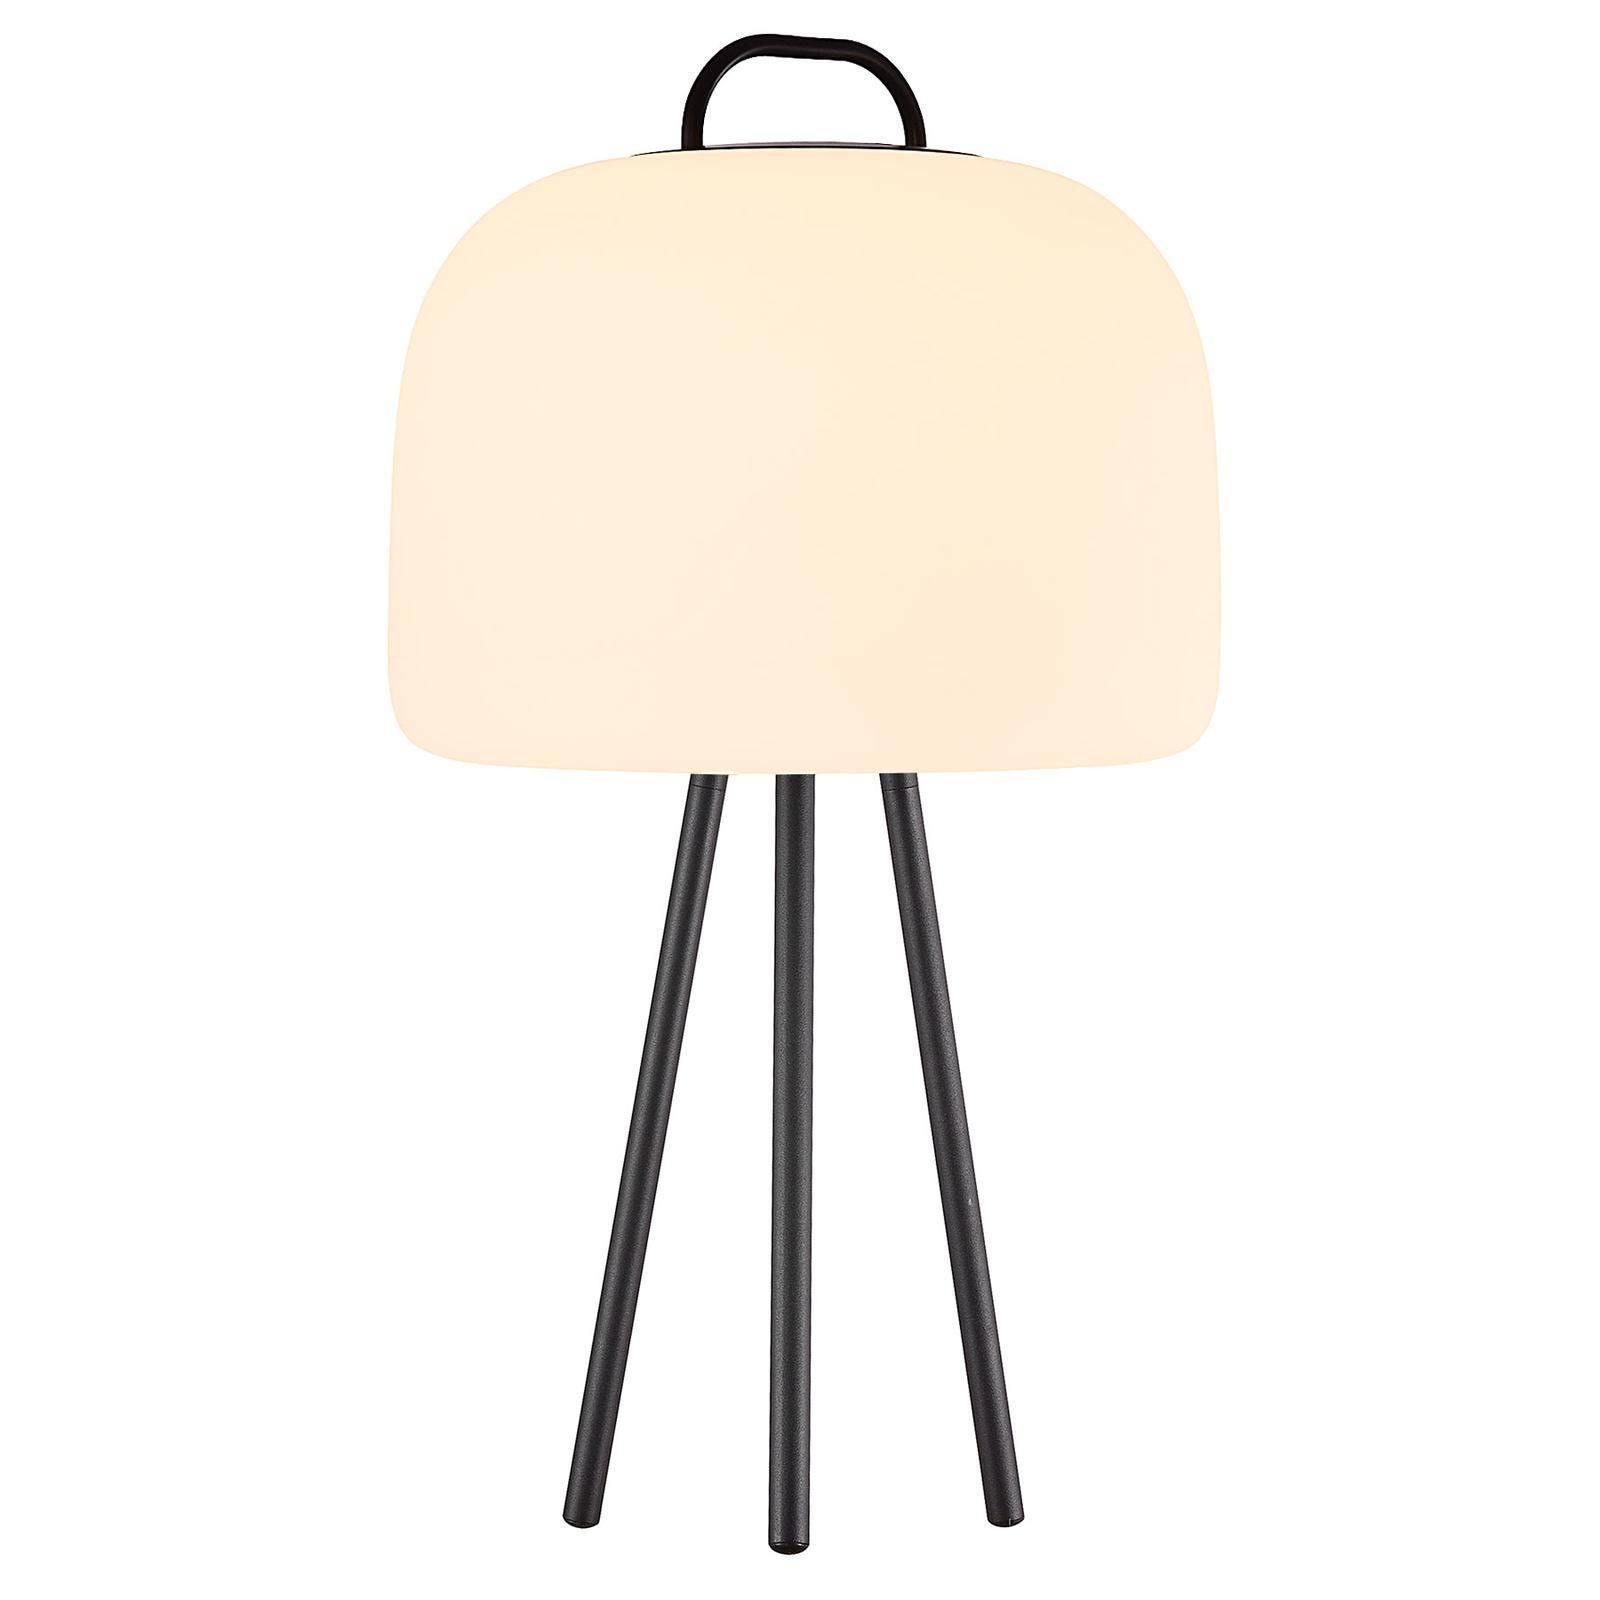 LED-pöytälamppu Kettle Tripod, varjostin 36 cm